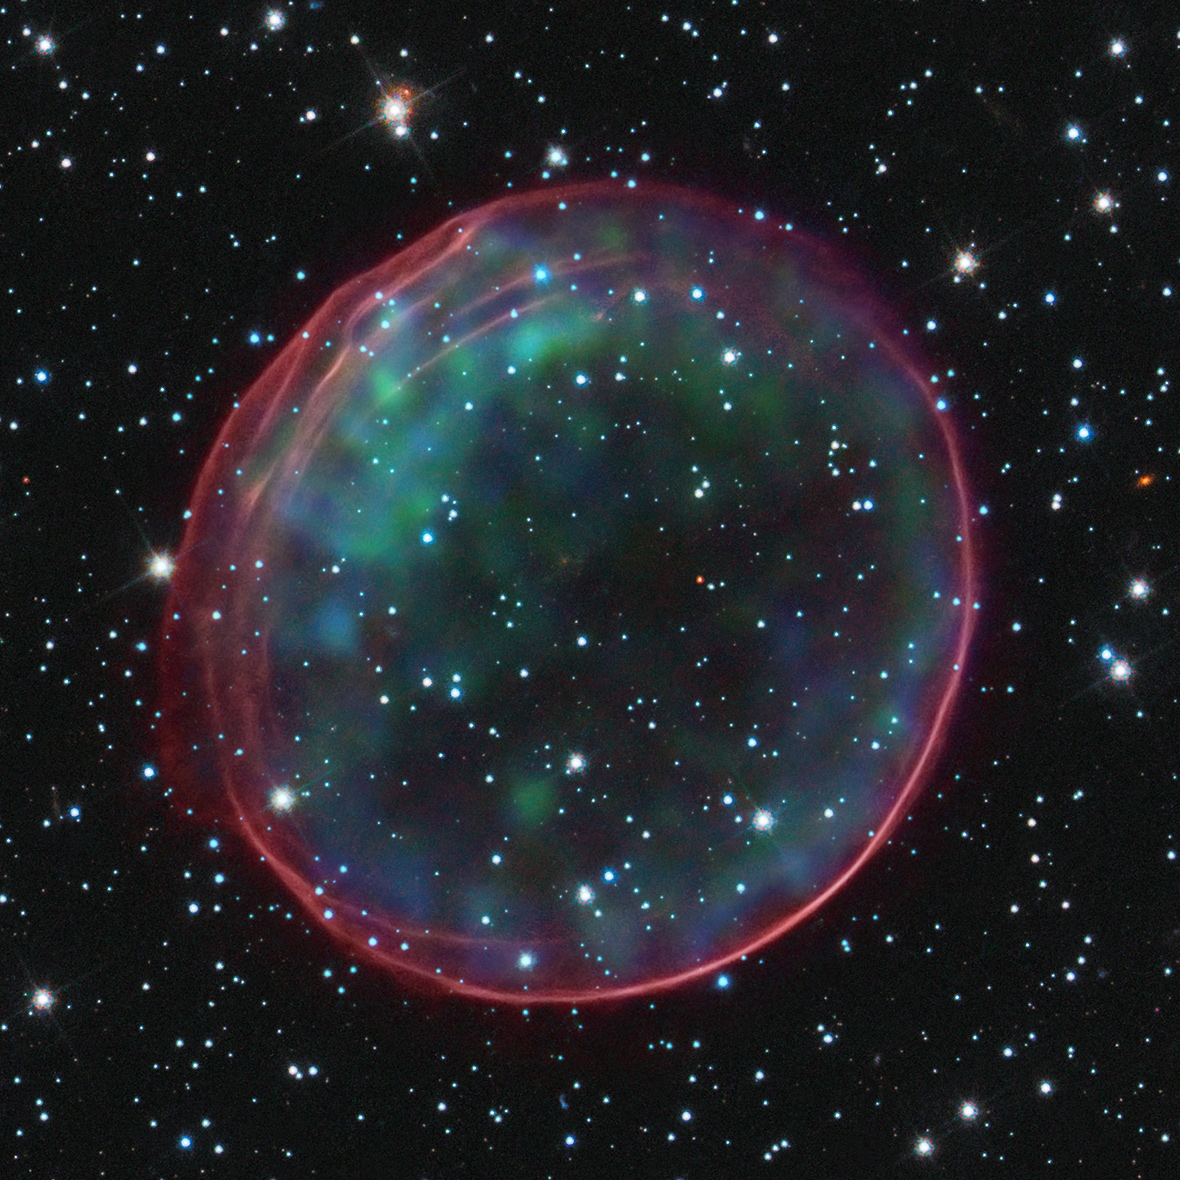 nasa.gov hubble telescope - photo #39